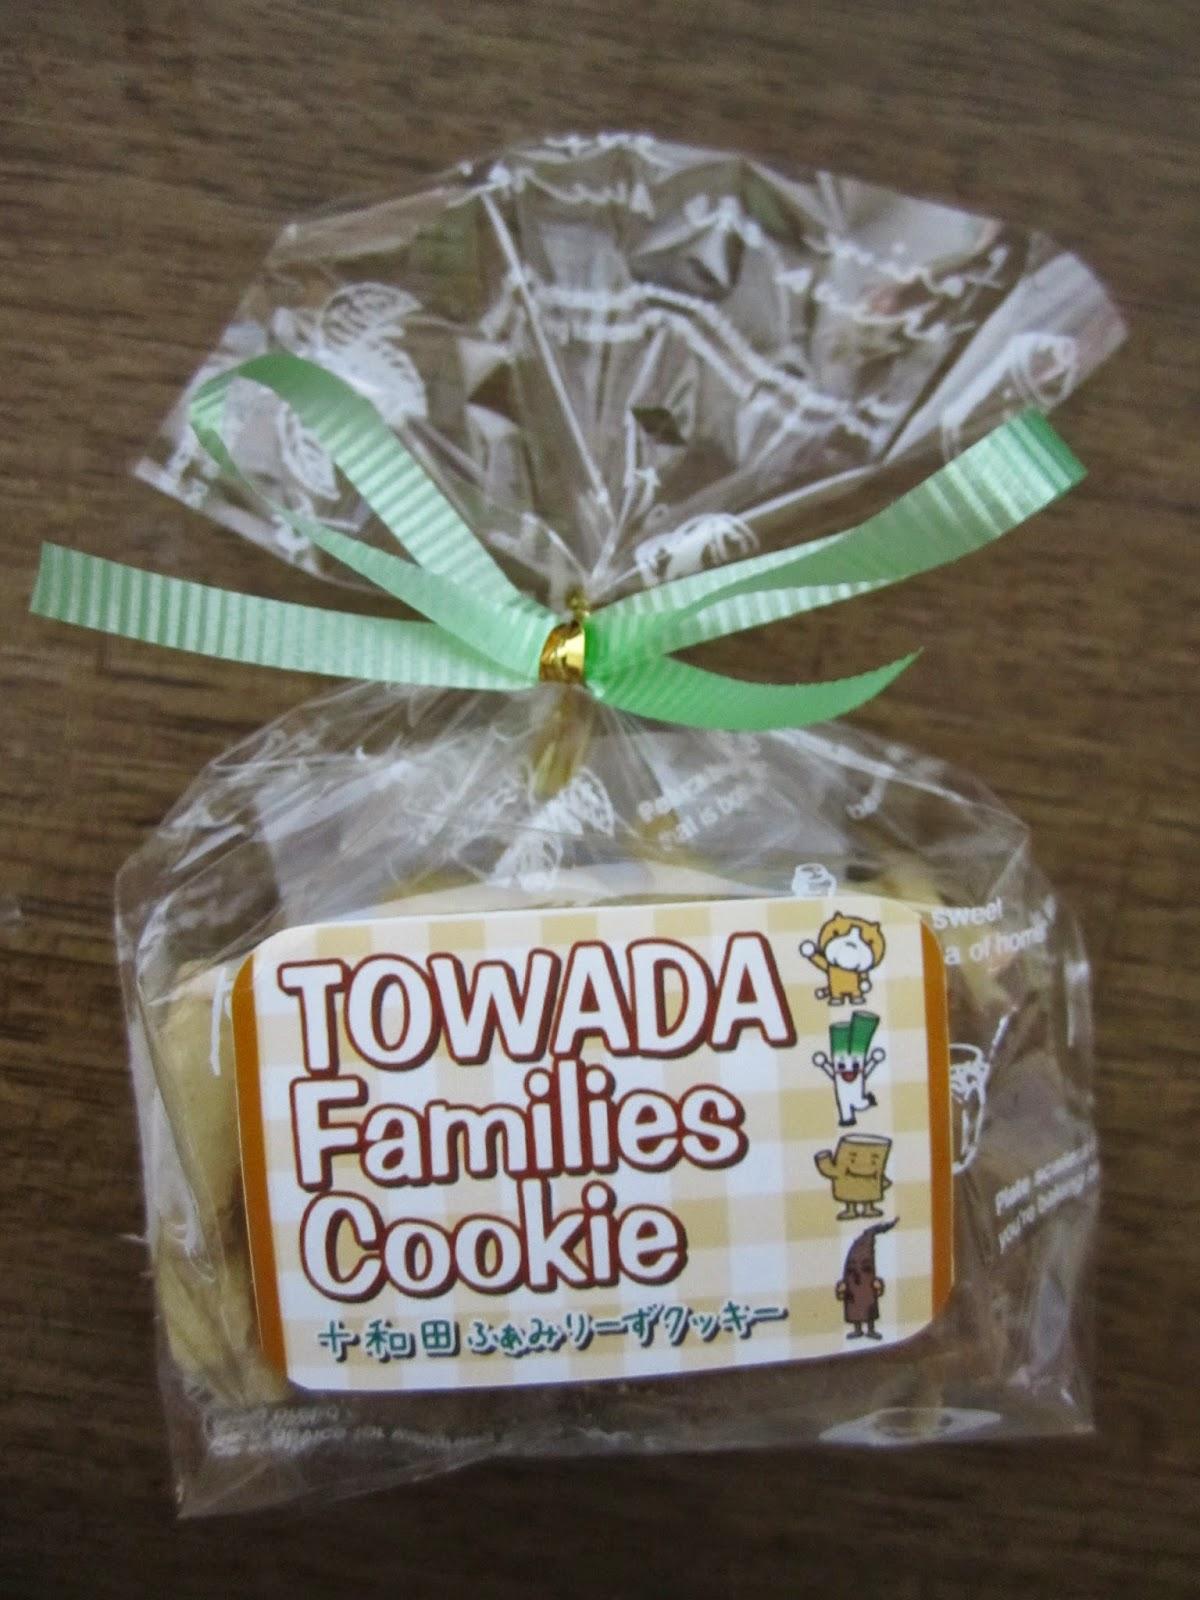 Towada Families Cookies 十和田ファミリーズクッキー